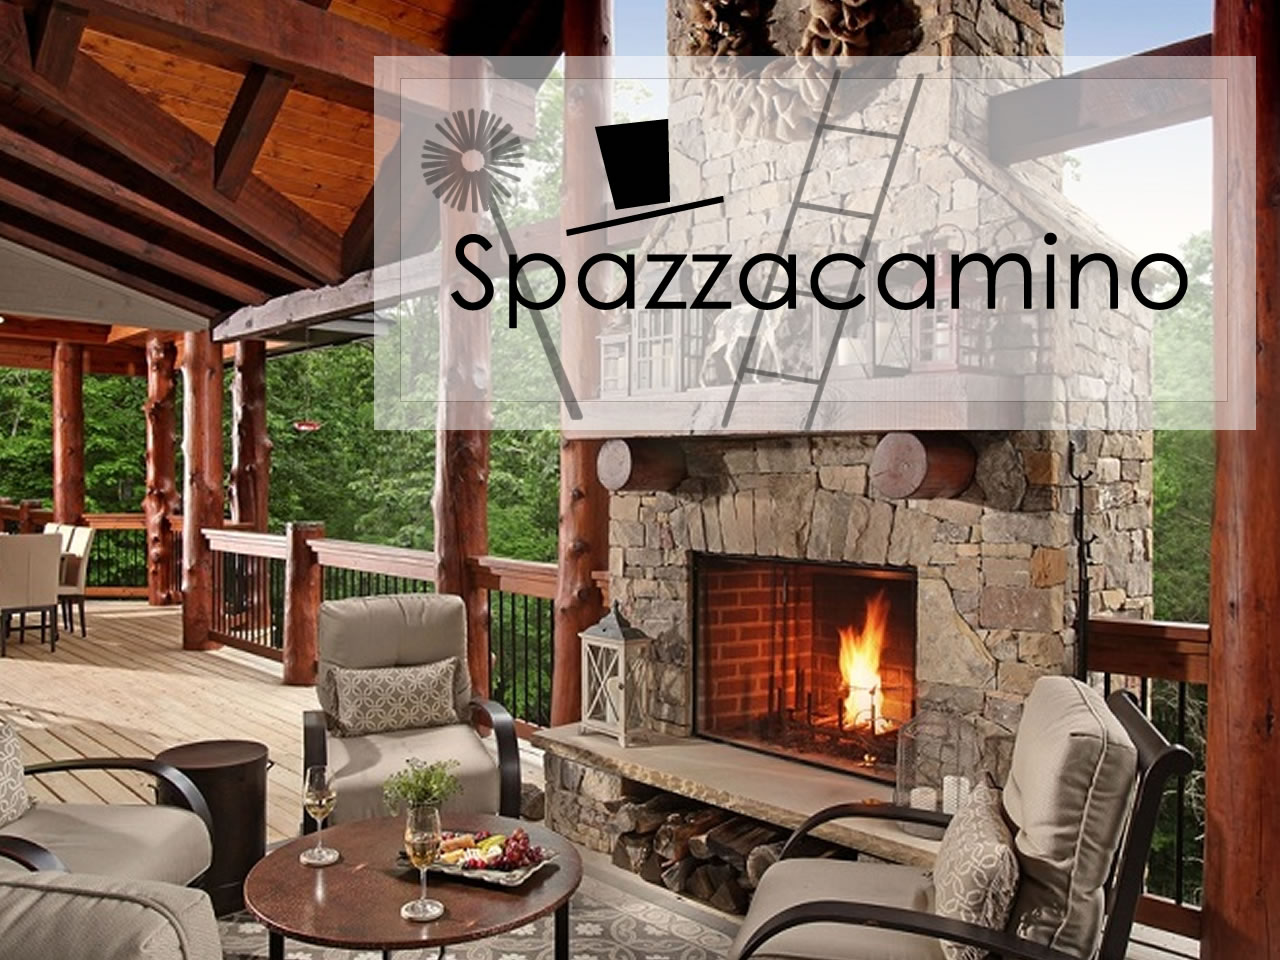 Villasanta - Spazzacamino Comignolo a Villasanta